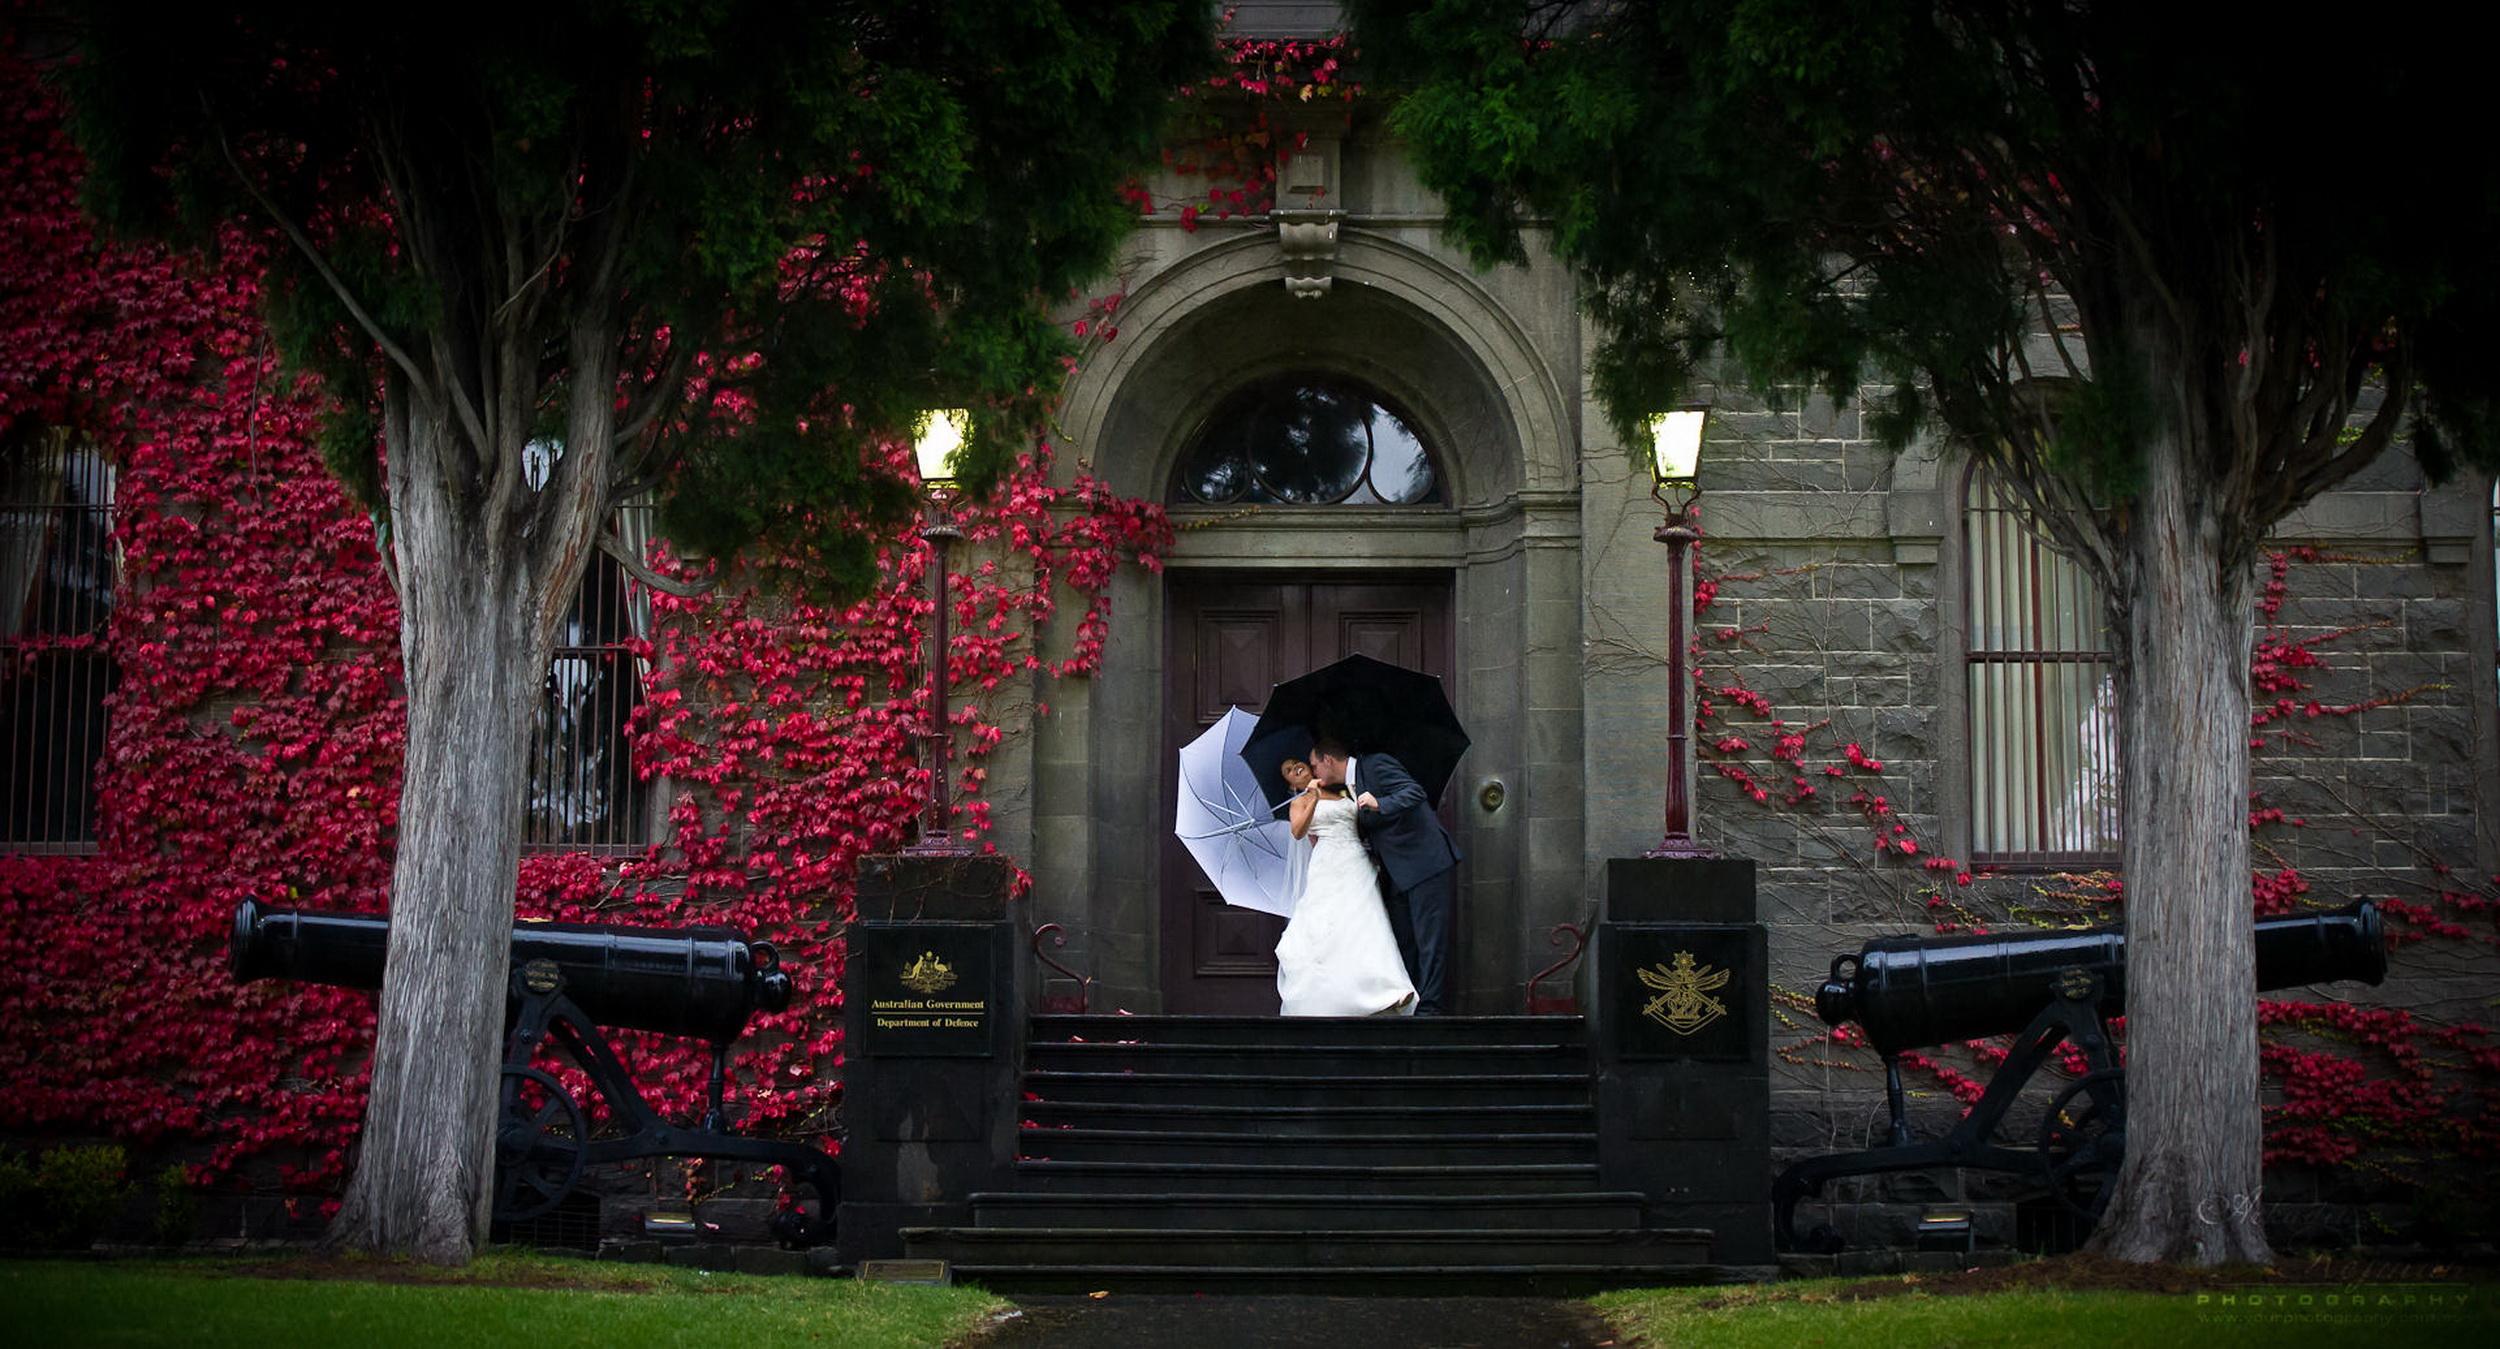 Wedding-Sarah-Chris-0211.jpg